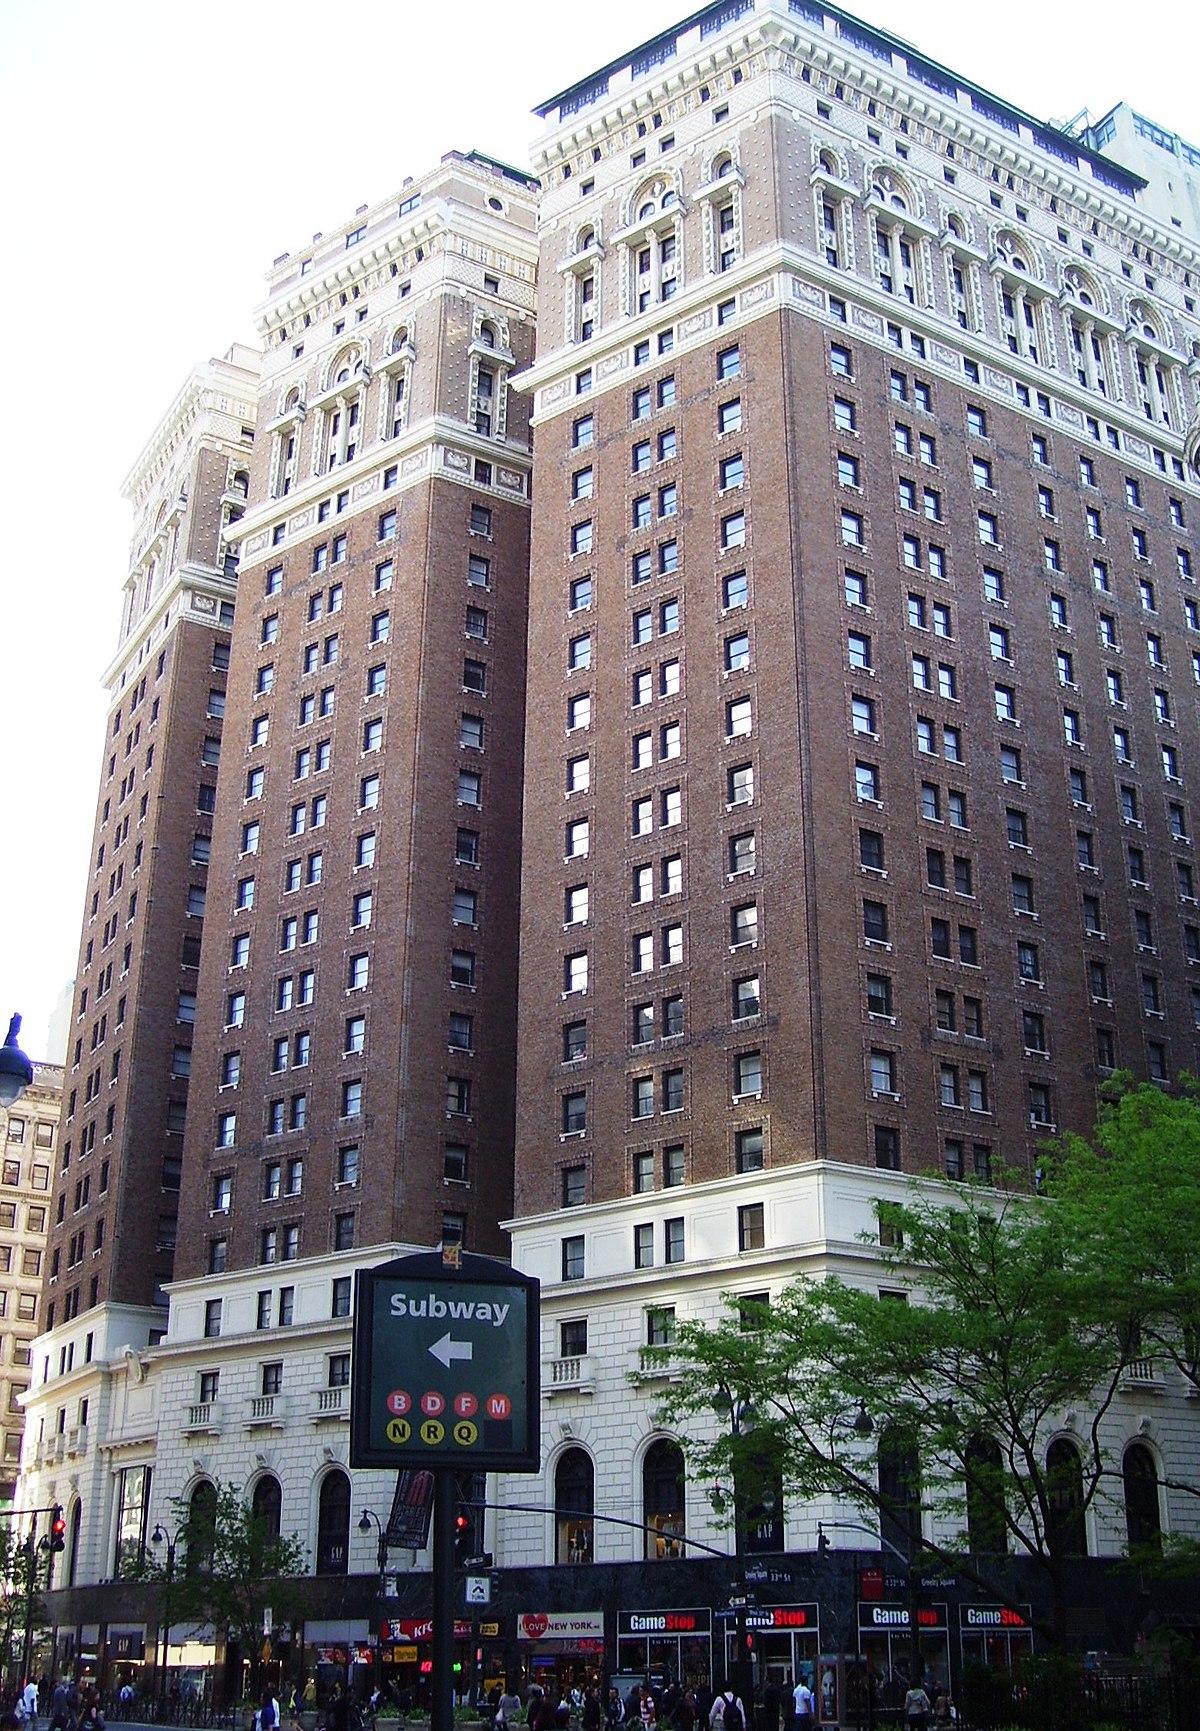 Hotel Mcalpin